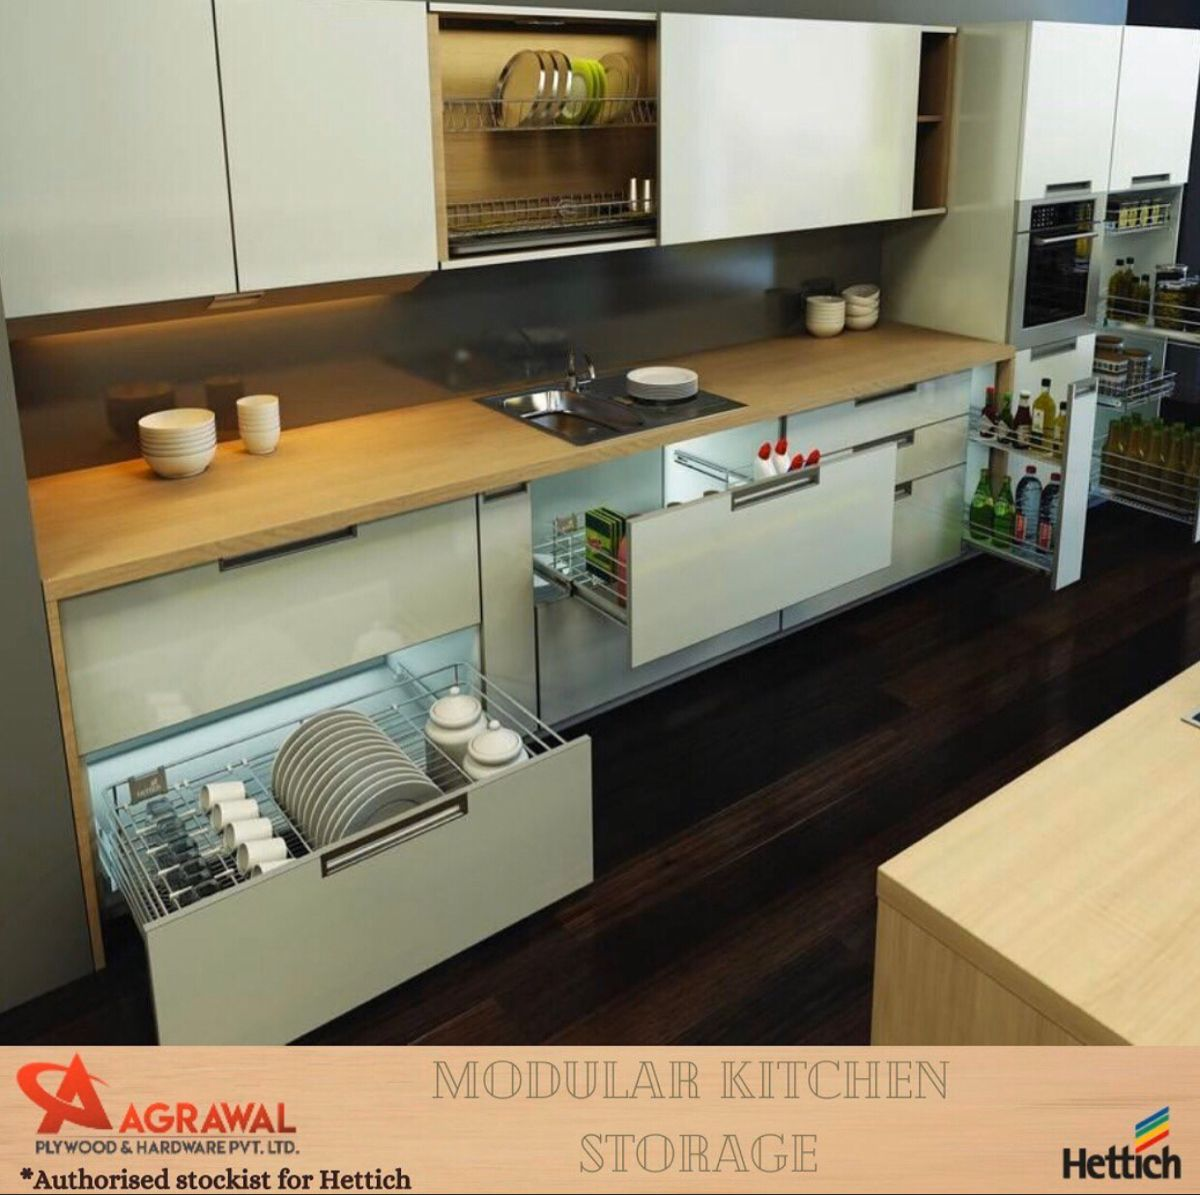 Wire baskets for your modular kitchen!  Classy as always with @agrawalgroup_  . . .  .  #plywood #wood #woodworking #plywoodfurniture #interiordesign #furniture #design #handmade #interior #architecture #furnituredesign #woodwork #diy #homedecor #multiplek #plywooddesign #triplek #carpentry #art #rakdinding #woodworker #cnc #rakkayu #ambalandinding #kitchen #catduco #rakbuku #dekorasikamar #rakpajangan #bhfyp